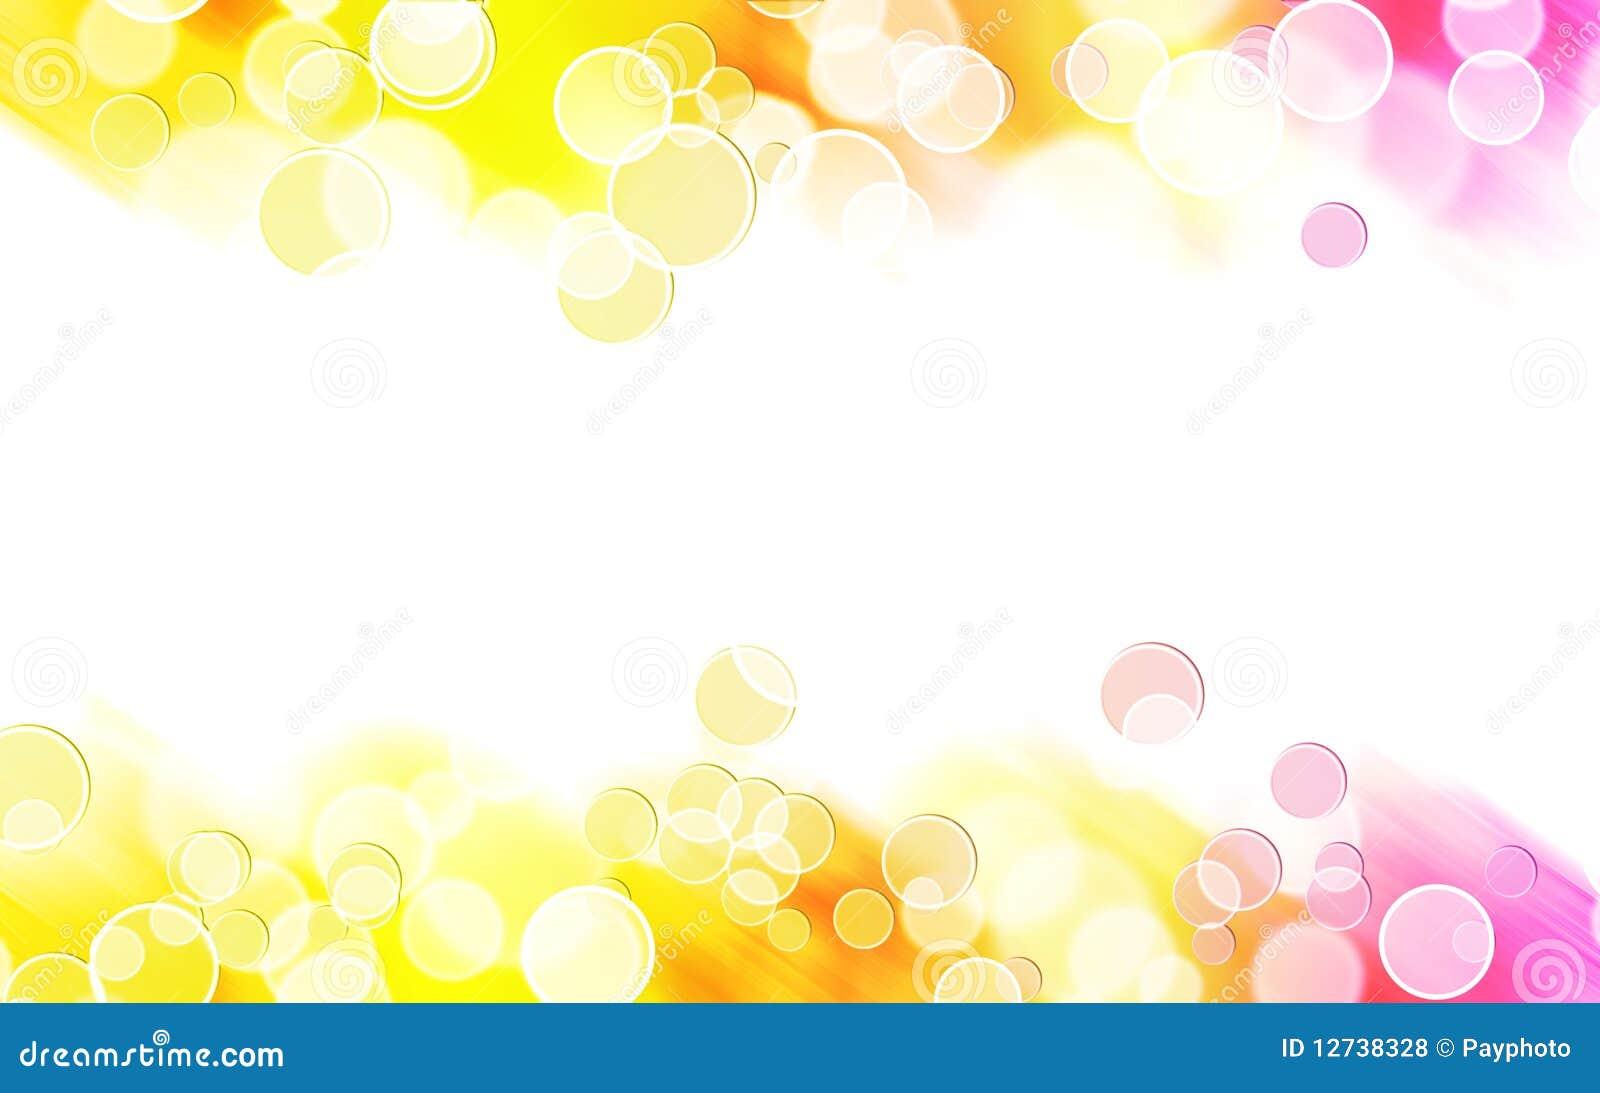 ... Colorful Bubble Border Royalty Free Stock Photos - Image: 12738328